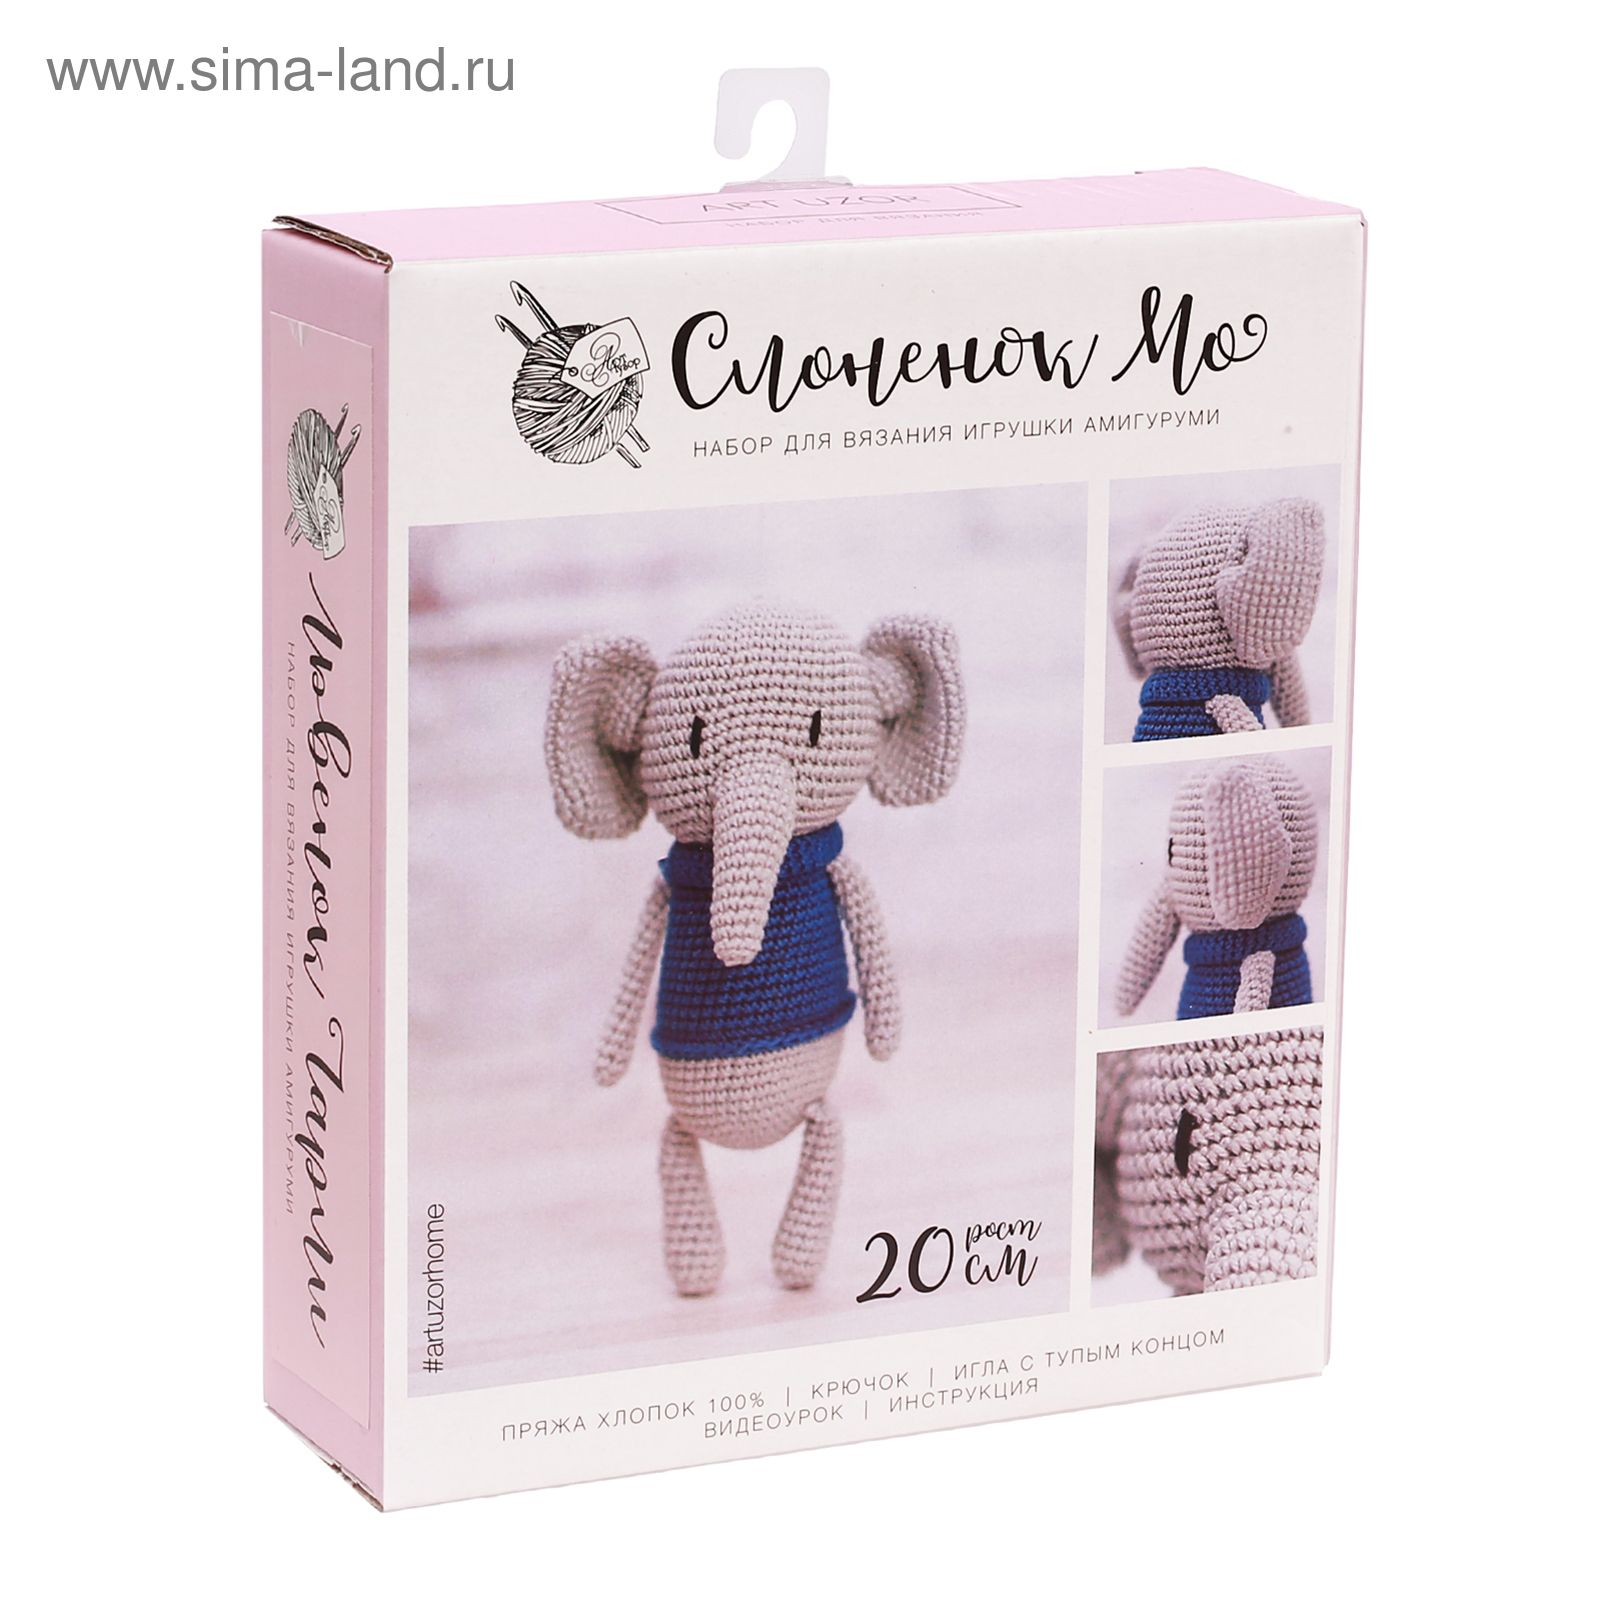 Набор для вязания Амигуруми Слоненок Мо 20см